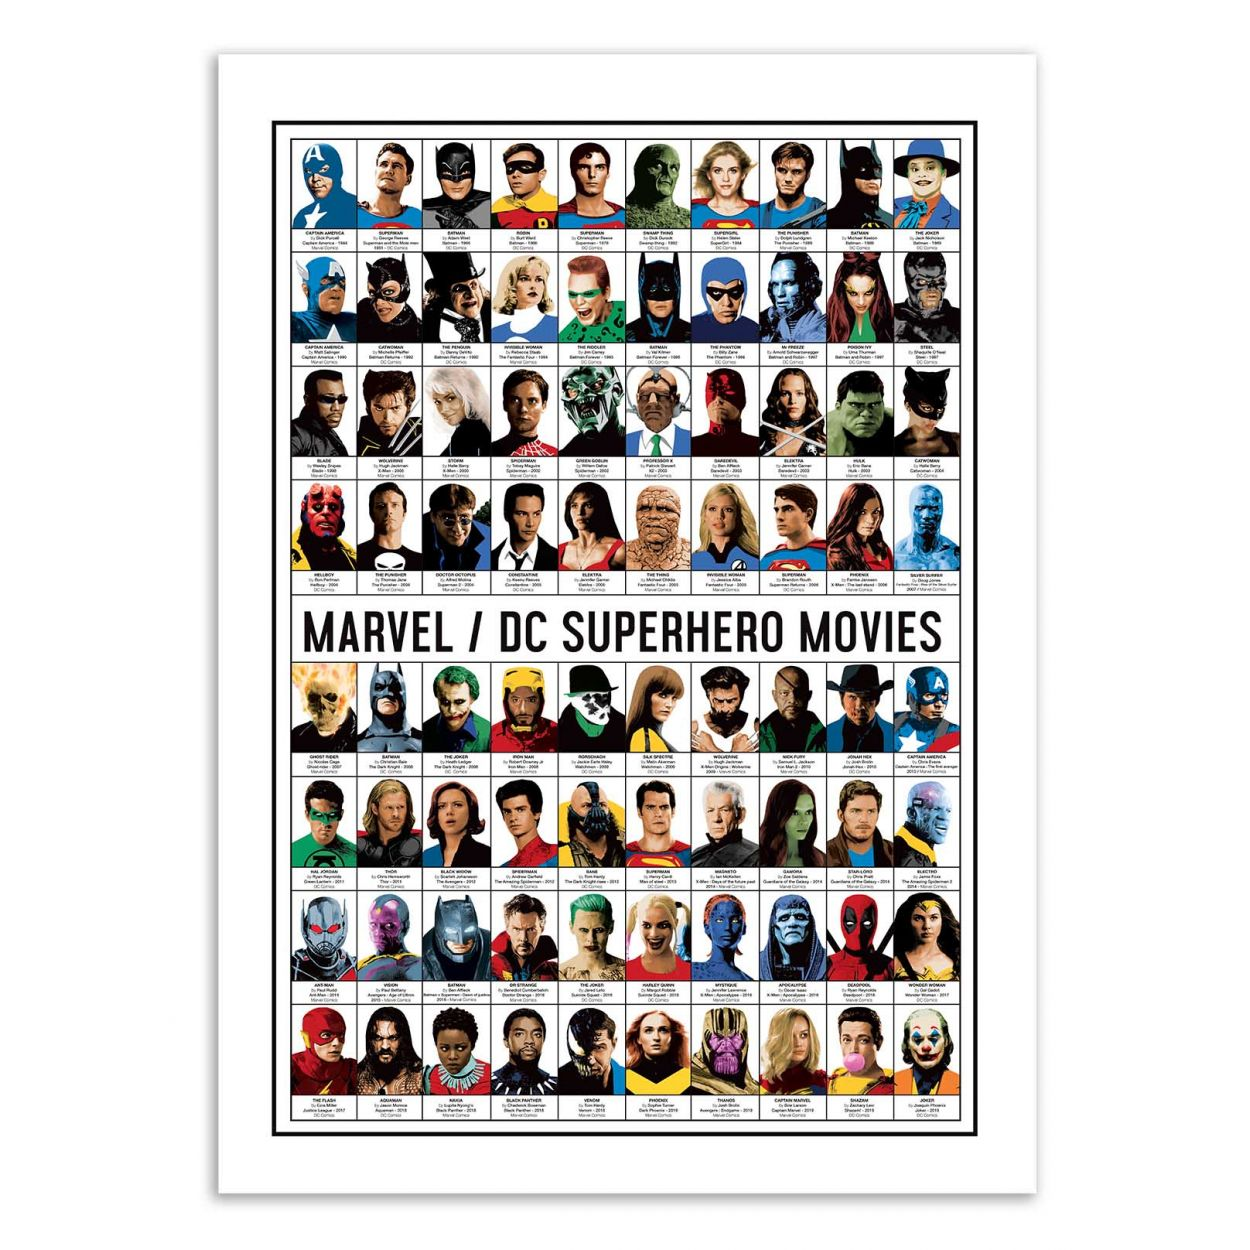 MARVEL AND DC SUPERHERO MOVIES - Affiche d'art 50 x 70 cm